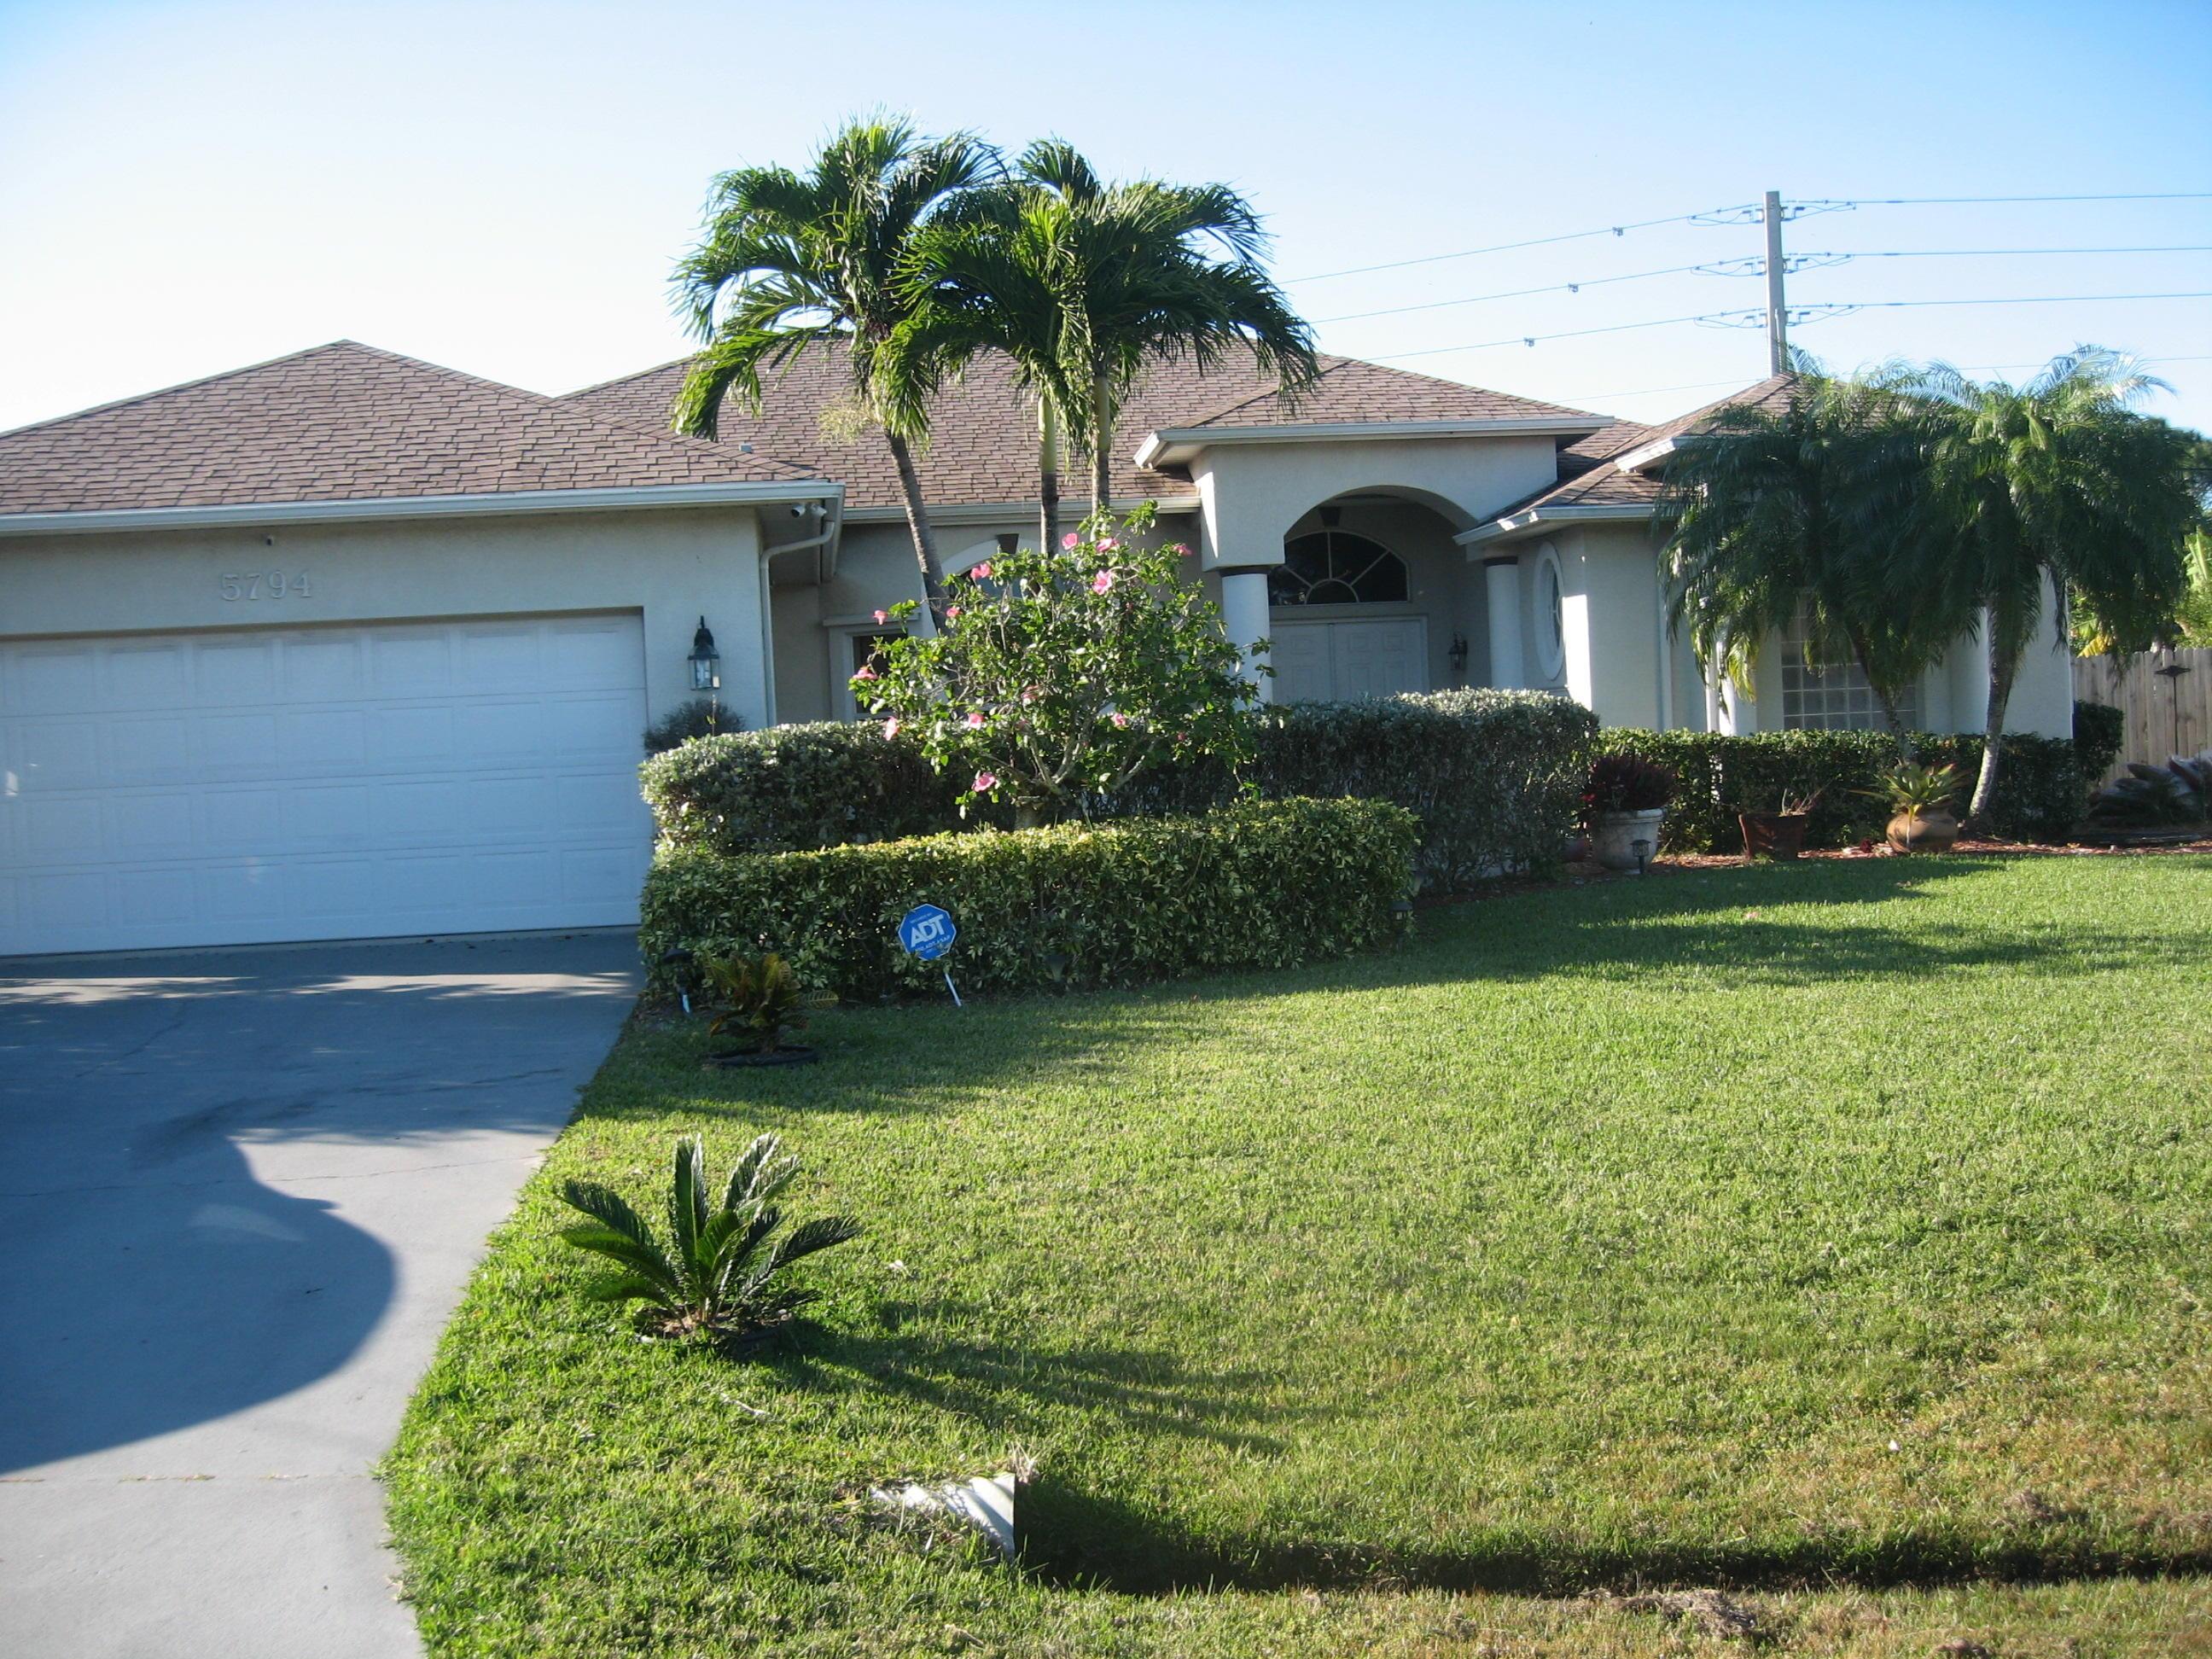 Details for 5794 Zinnia Street Nw, Port Saint Lucie, FL 34986